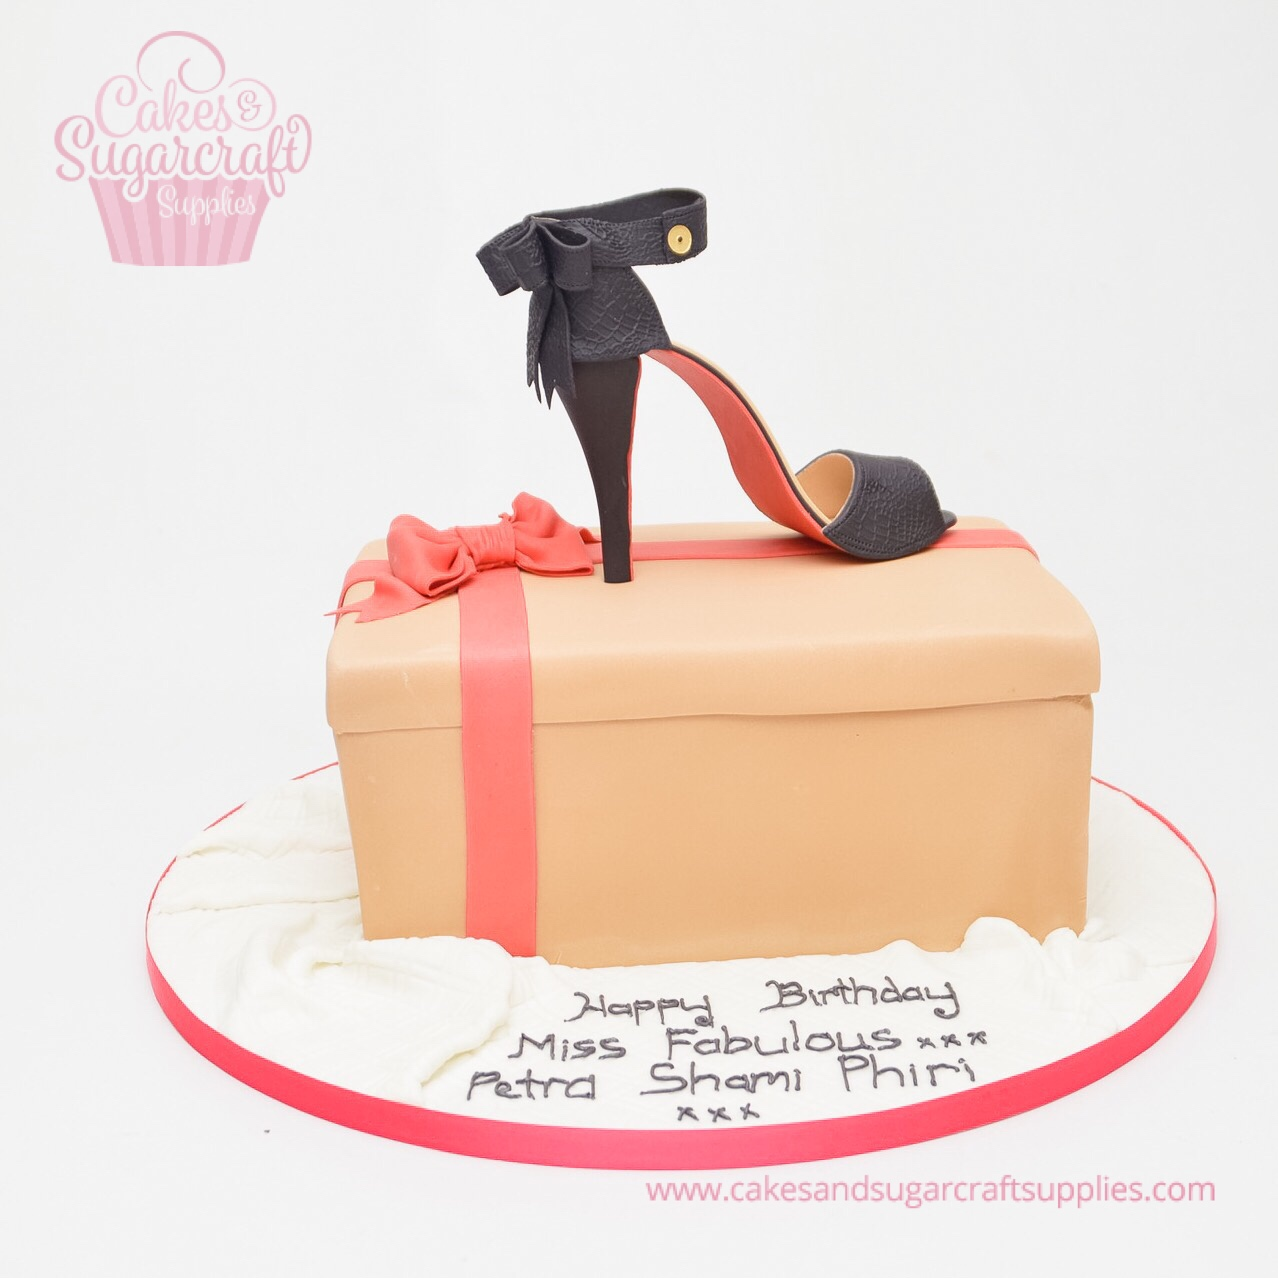 Ladies Birthday Cakes Cakes Sugarcraft Supplies